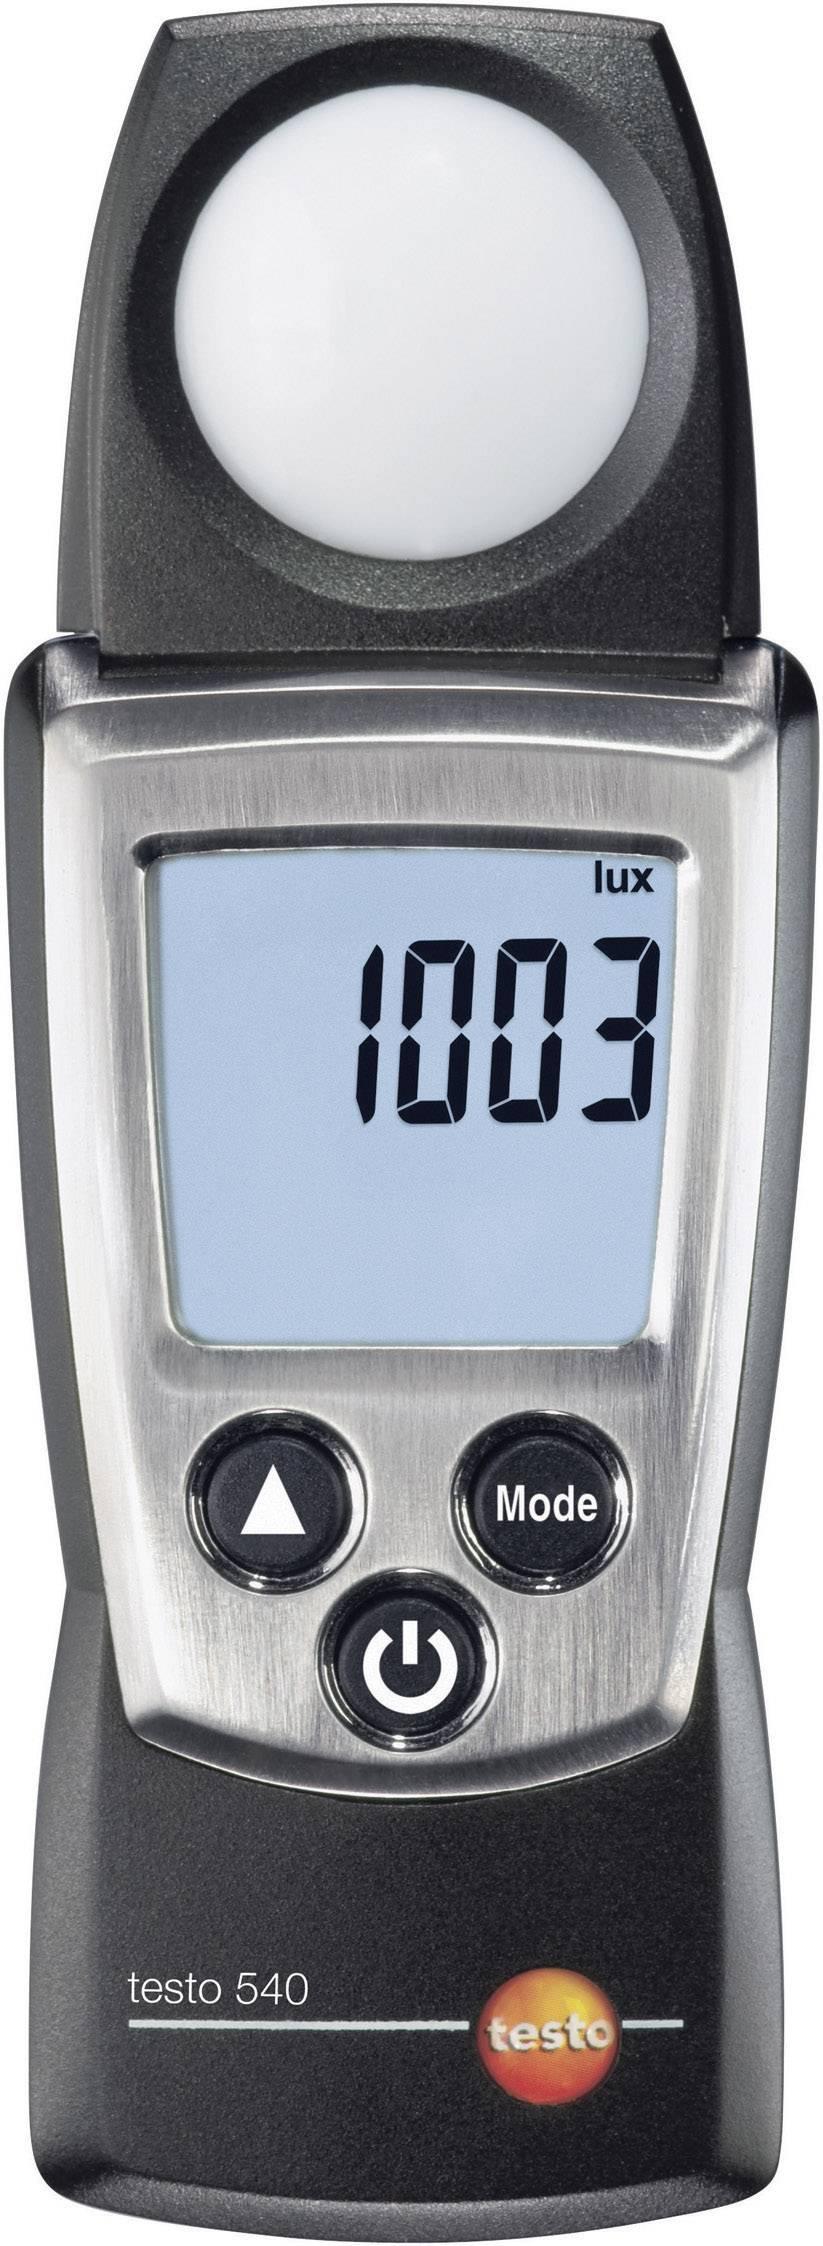 Luxmeter testo 540